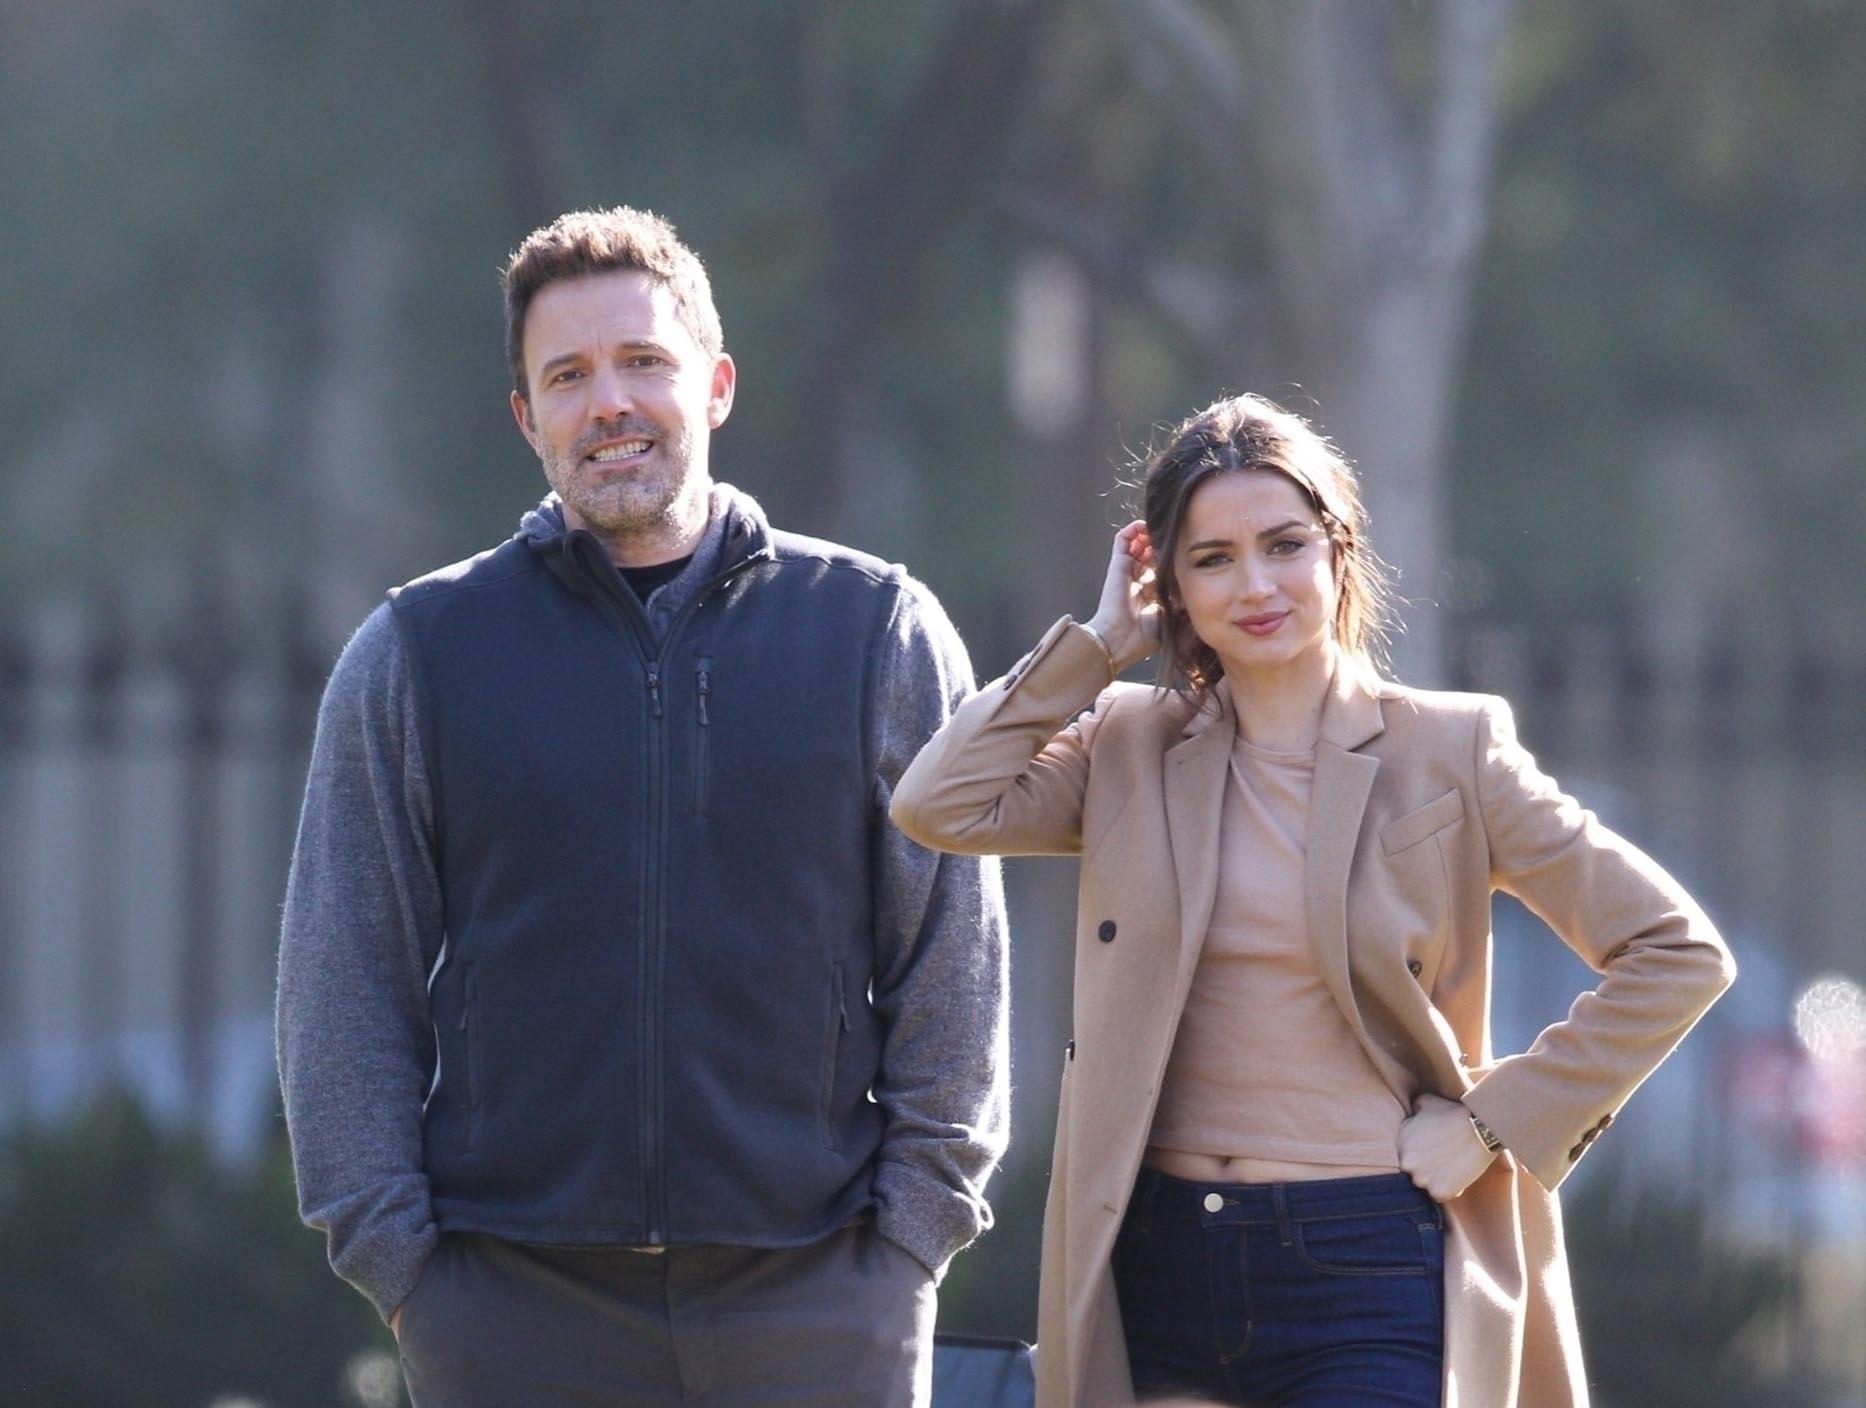 Chip Et Joanna Separation ben affleck dating ana de armas - celeb love news for march